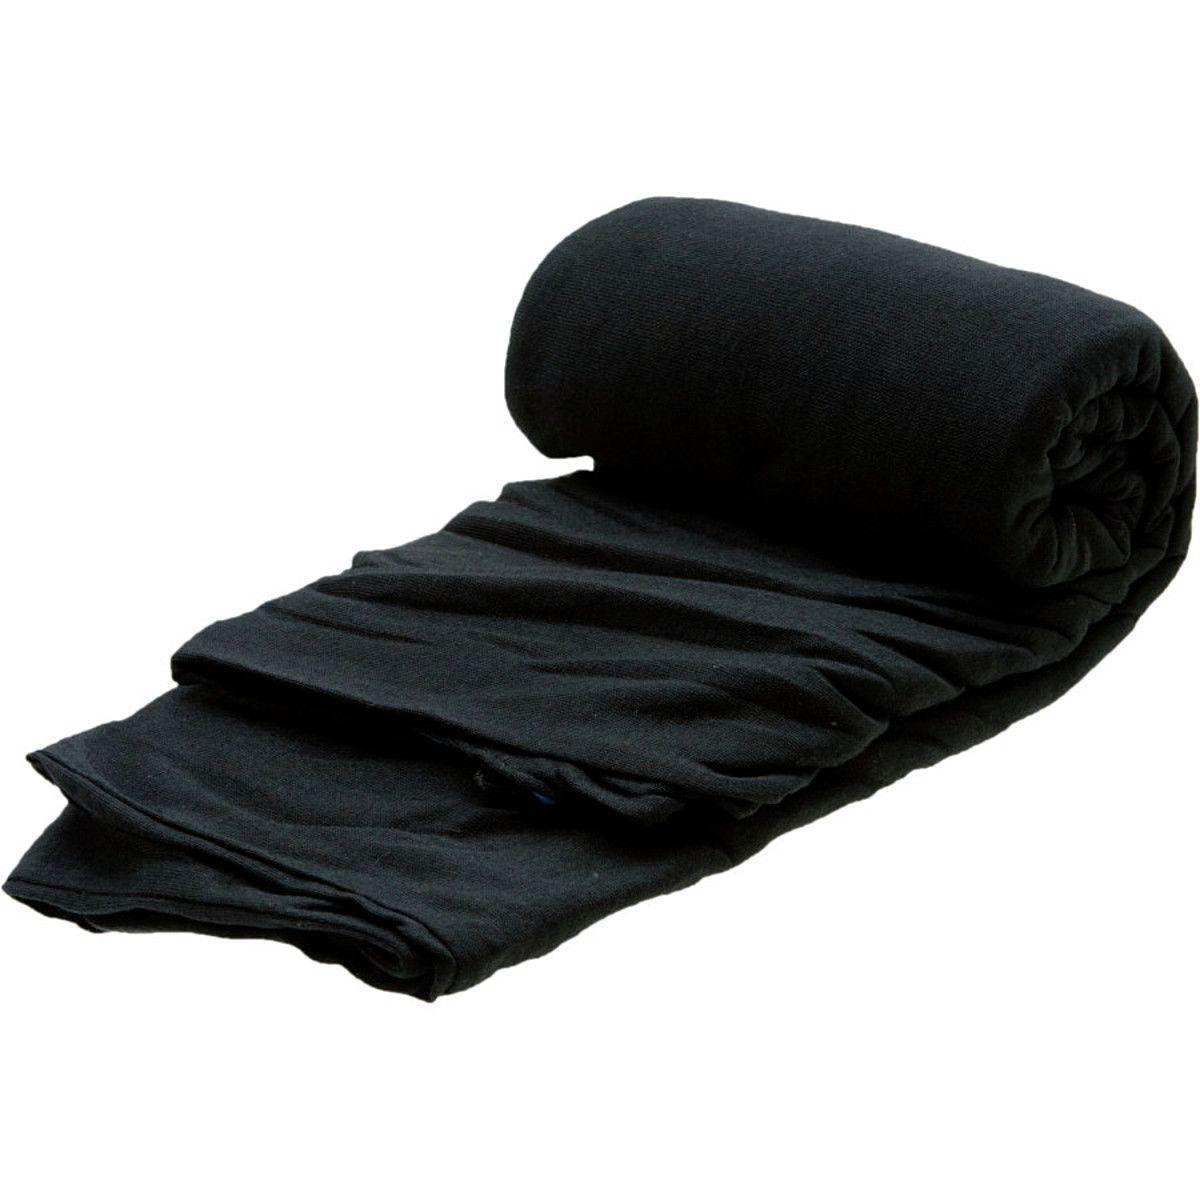 Sleeping Bag Liners